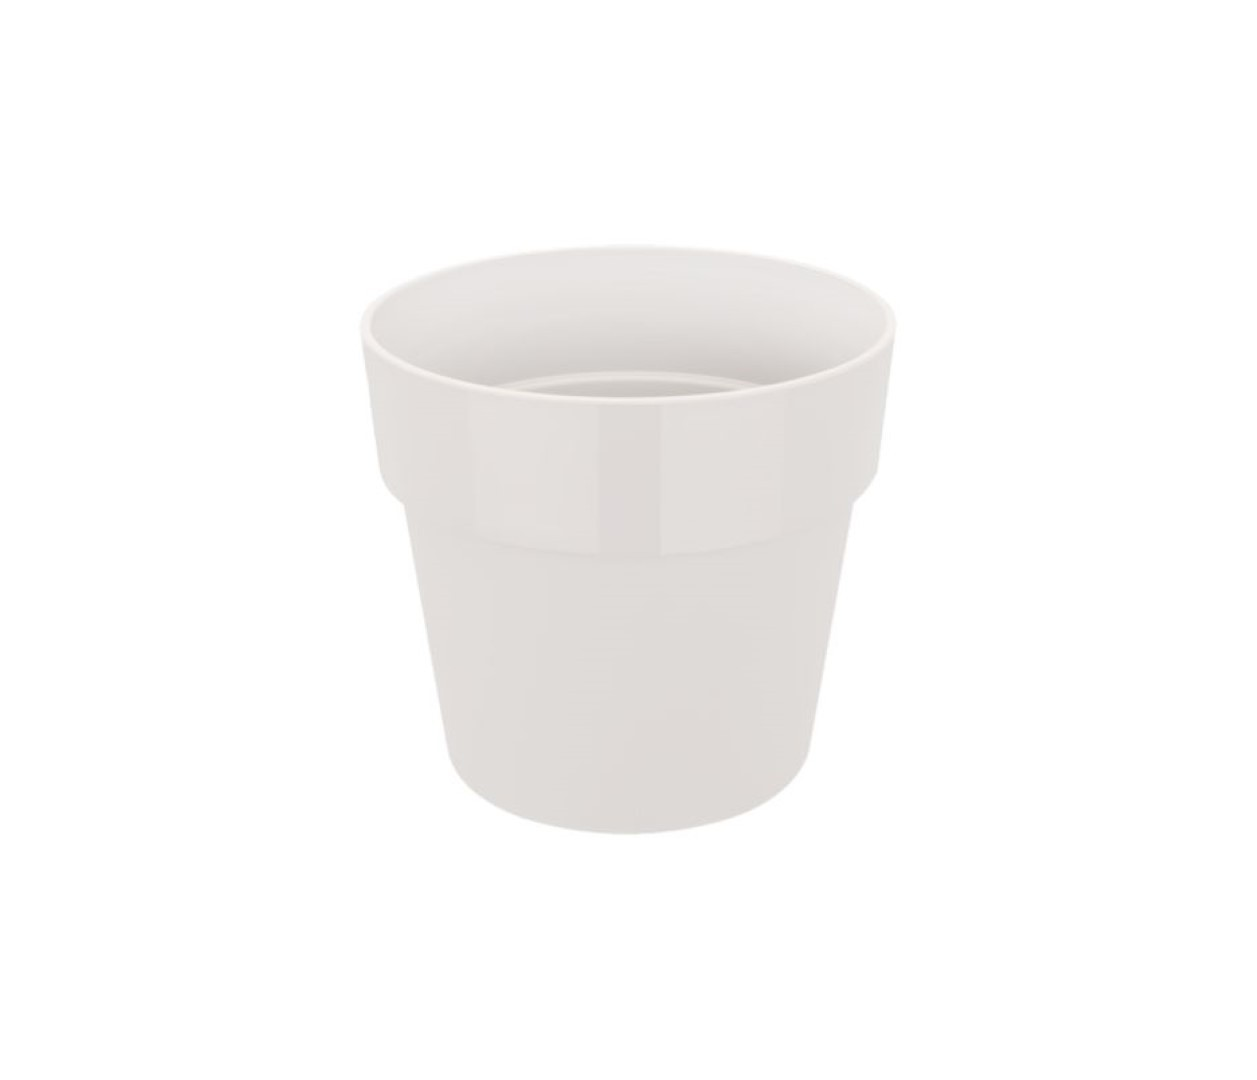 B.for original rond 30 bloempot wit binnen dia. 29,5 x h 27,2 cm